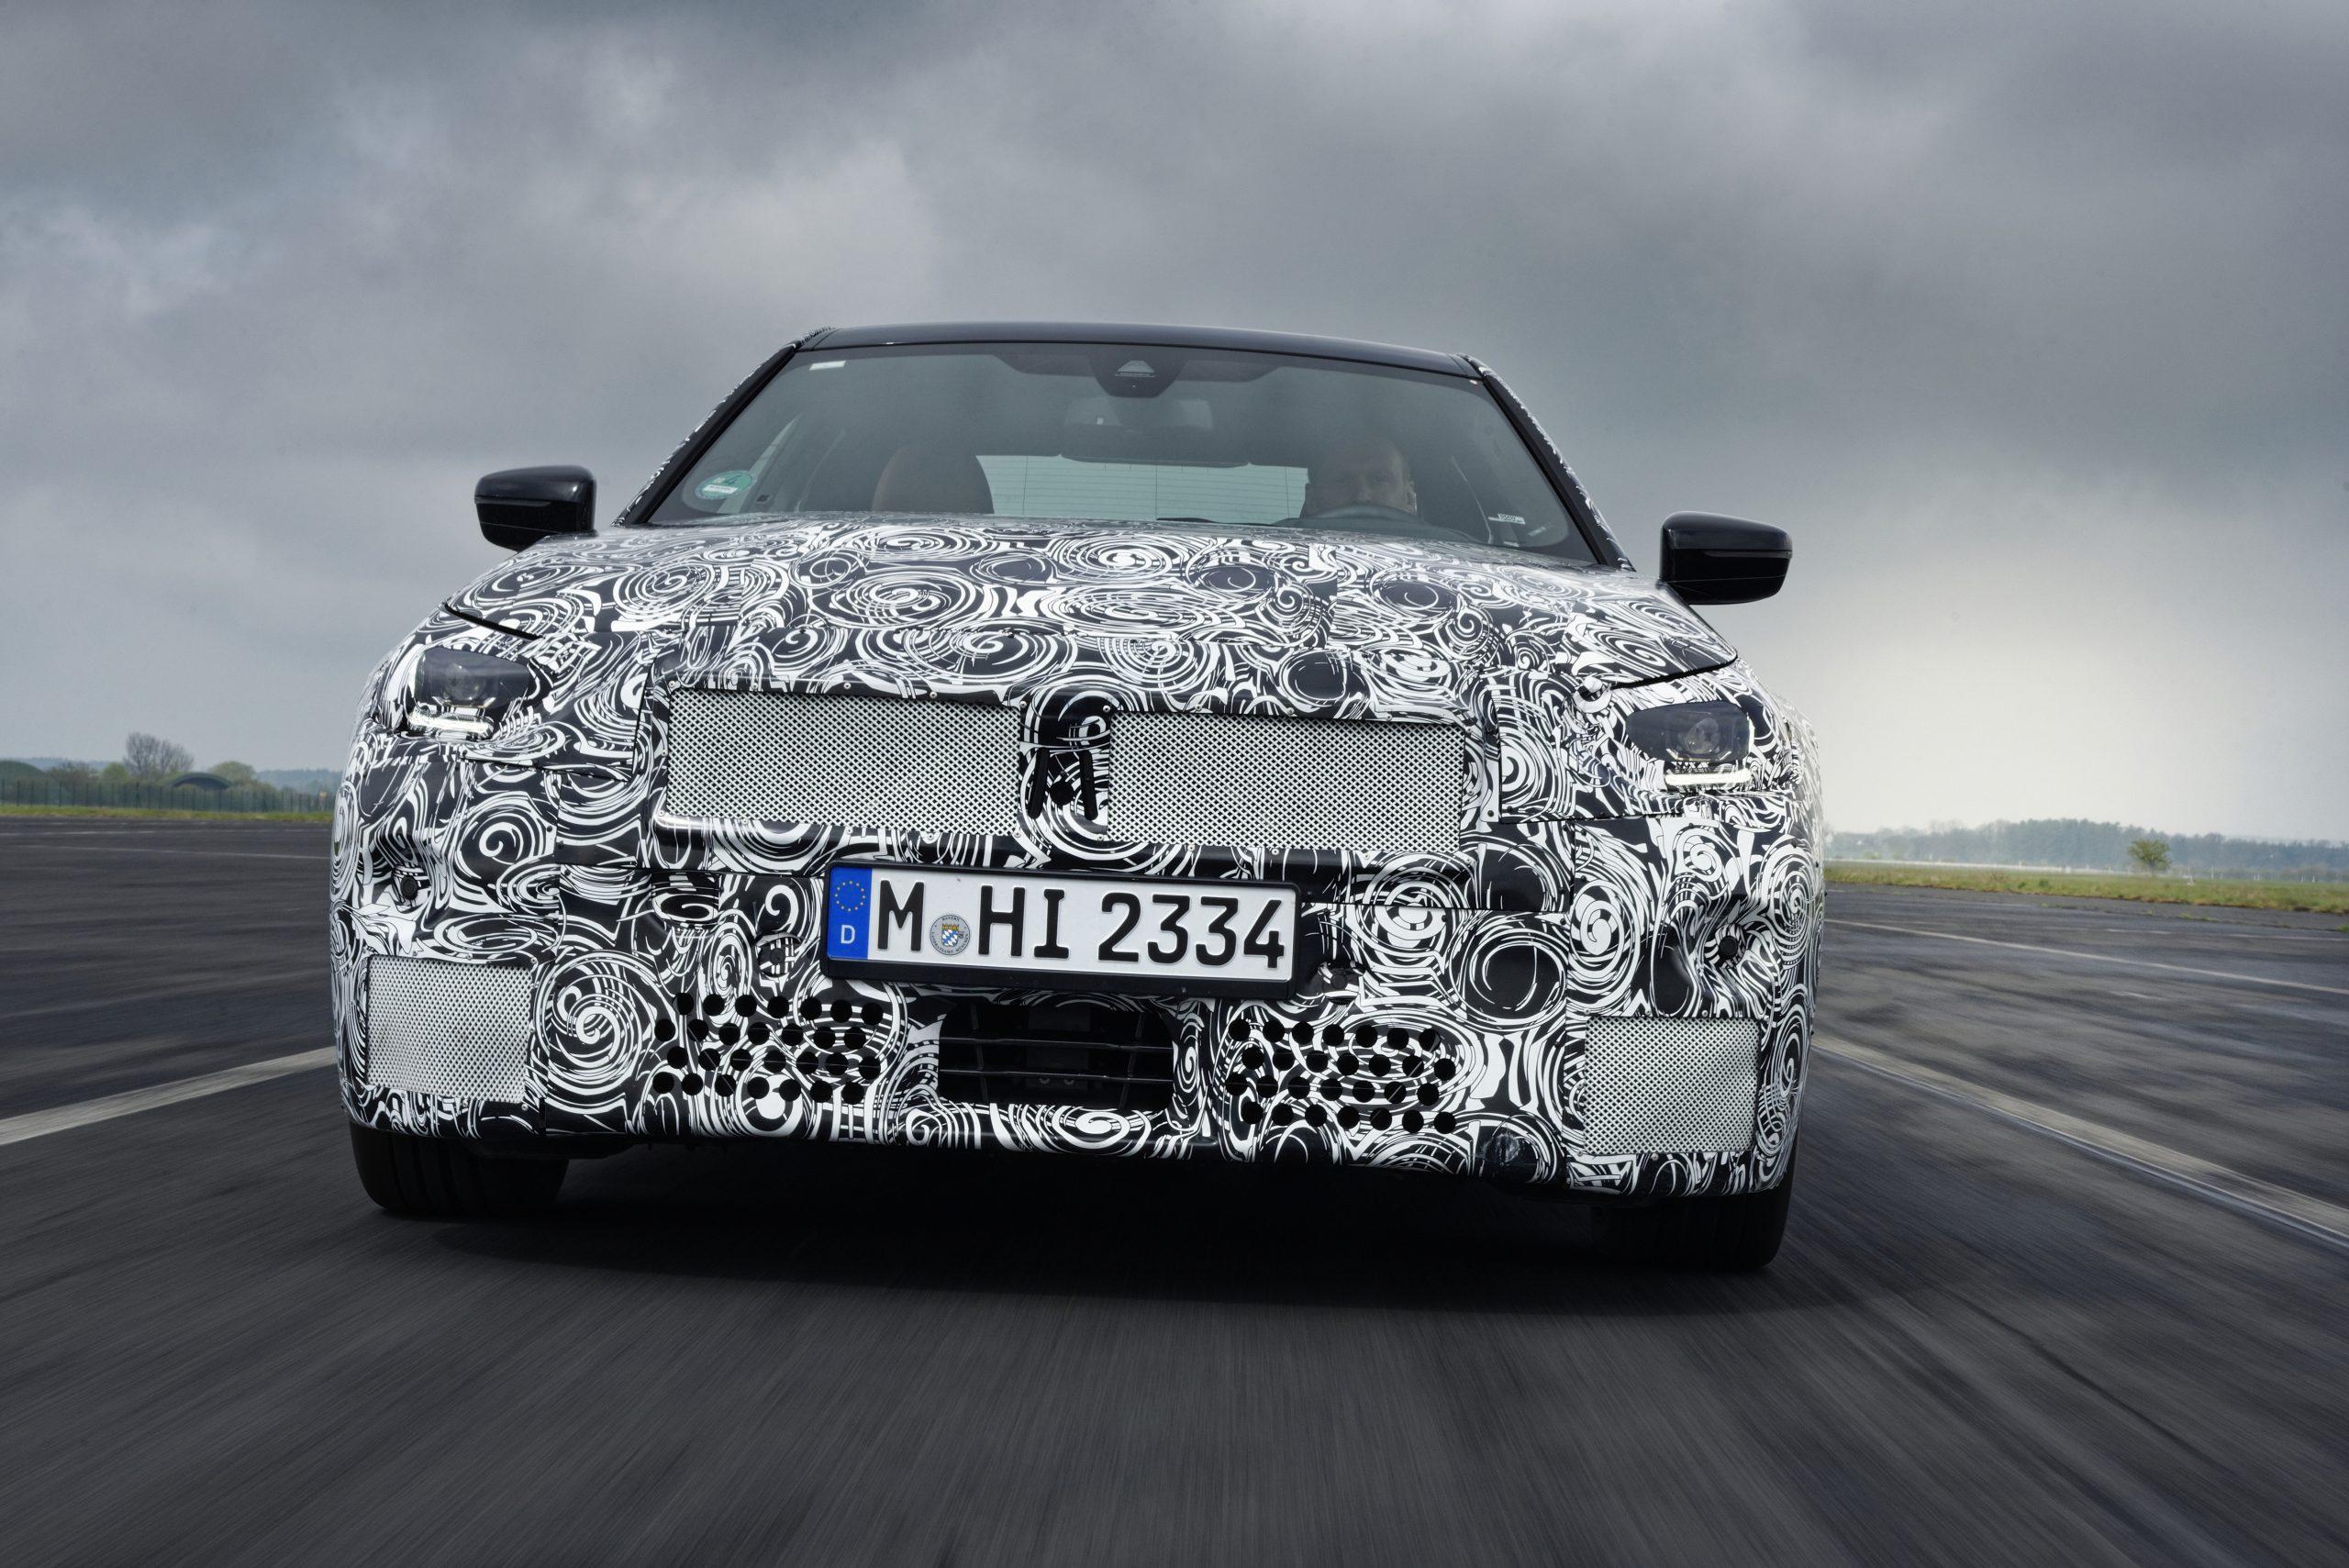 BMW 2 Series Coupe camo testing